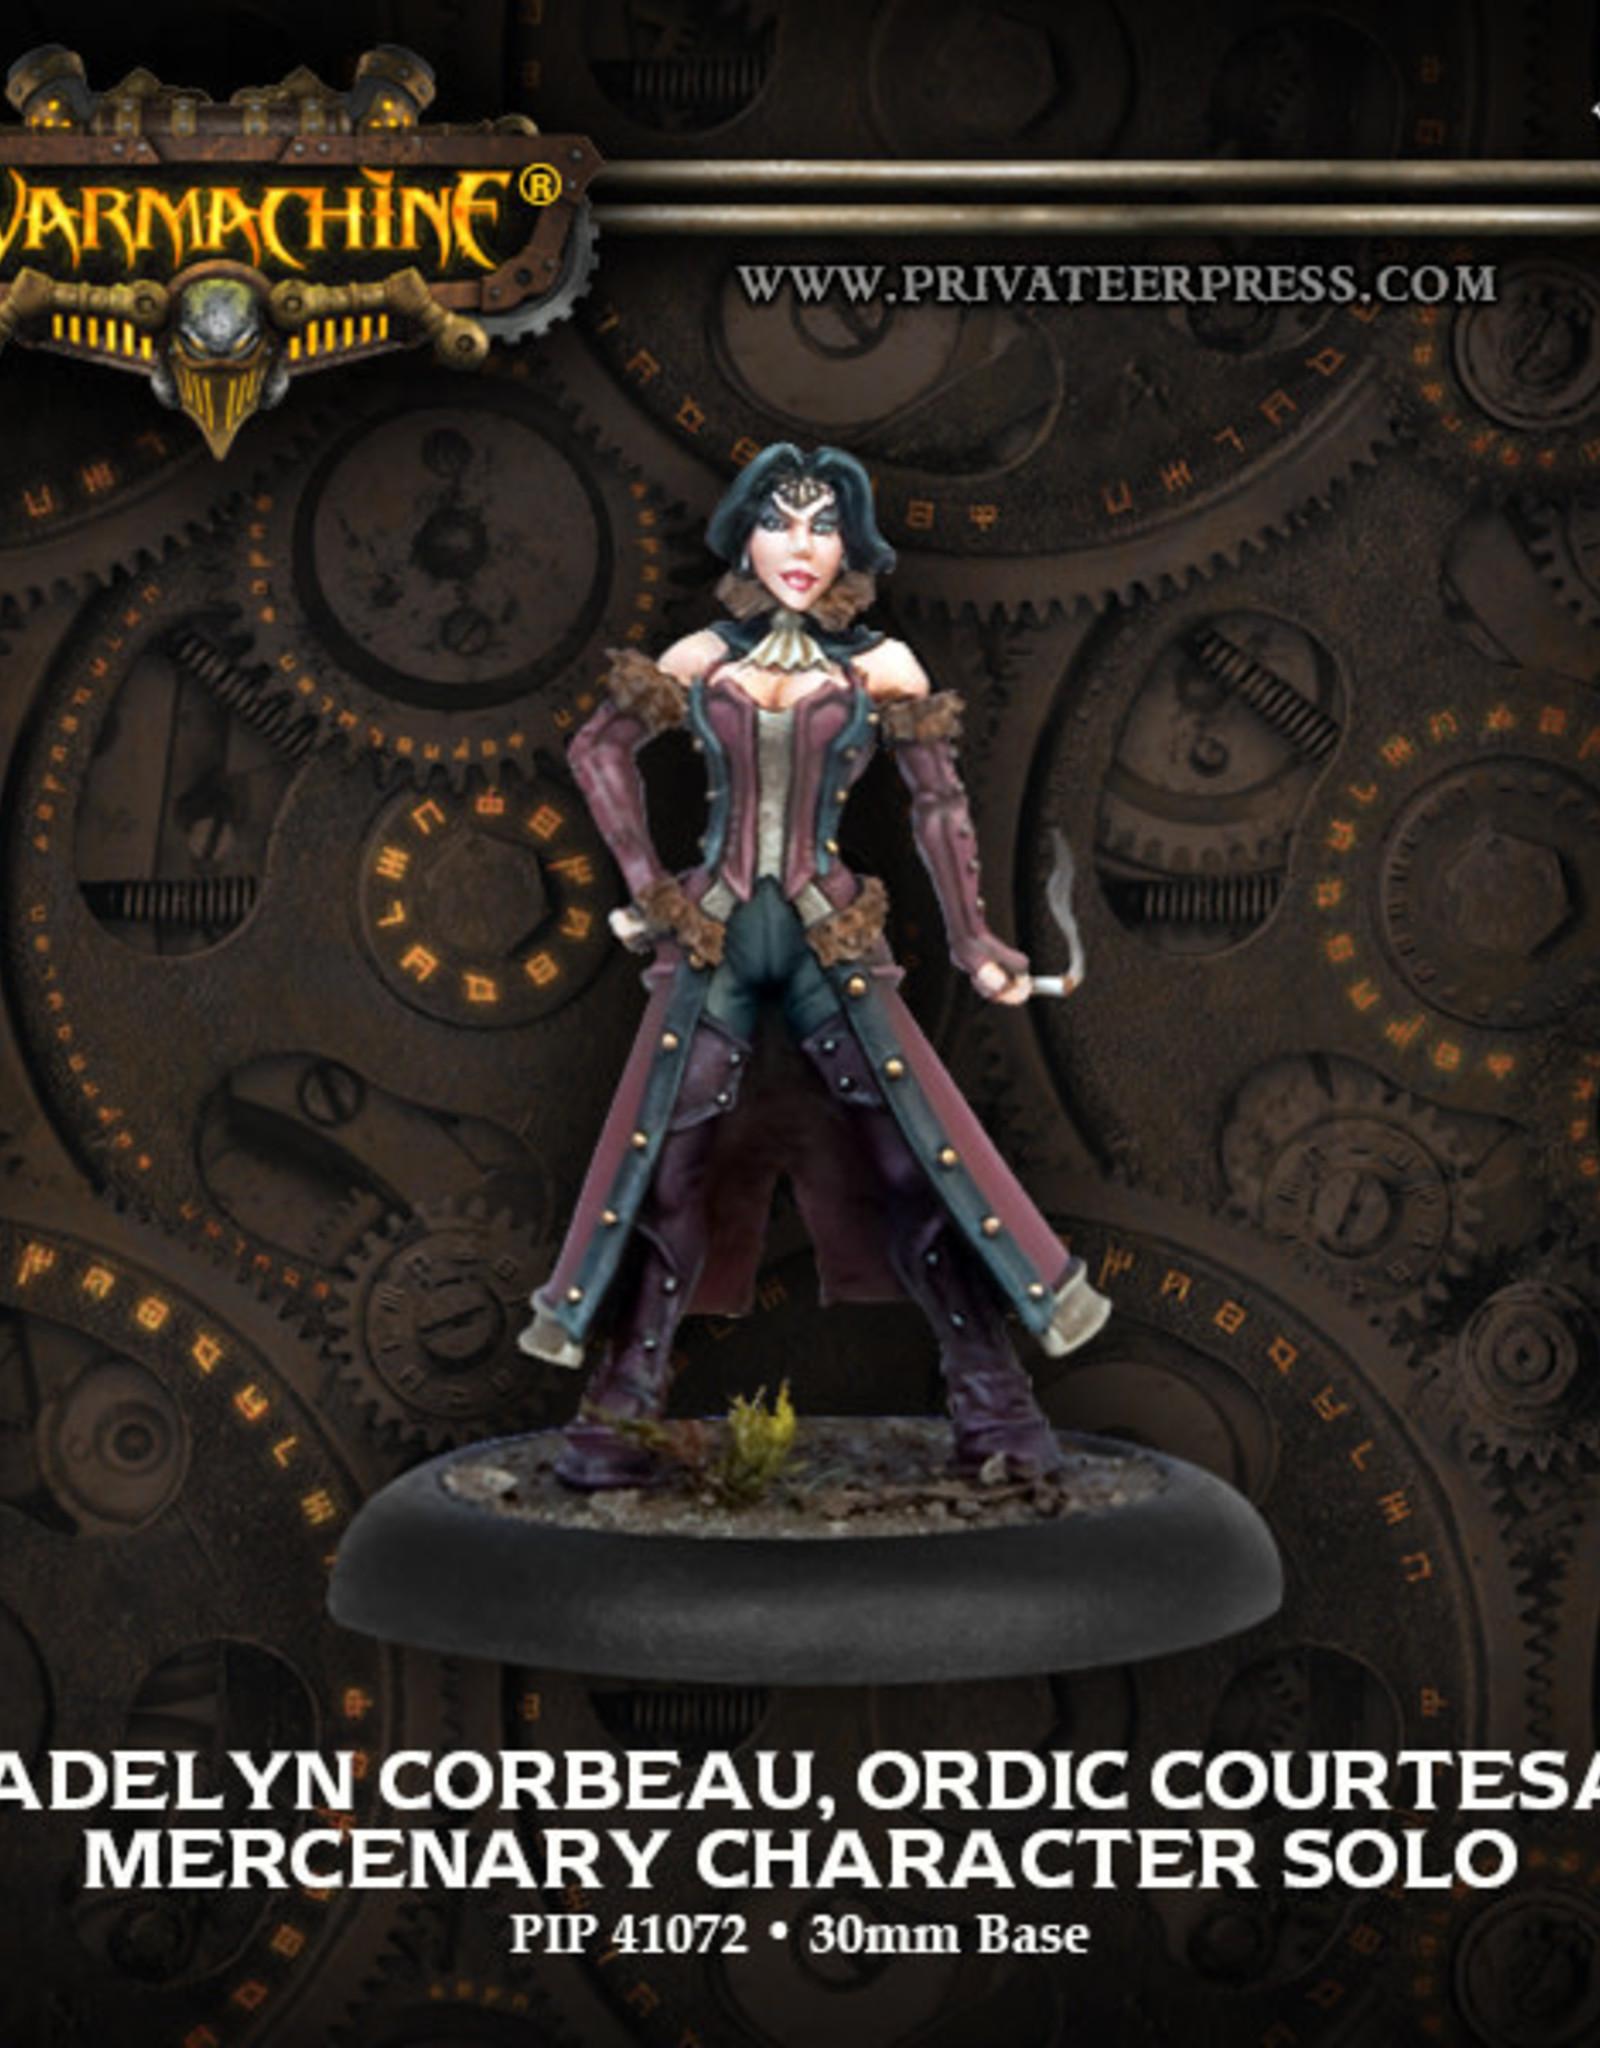 Warmachine Mercenaries - Madelyn Corbeau